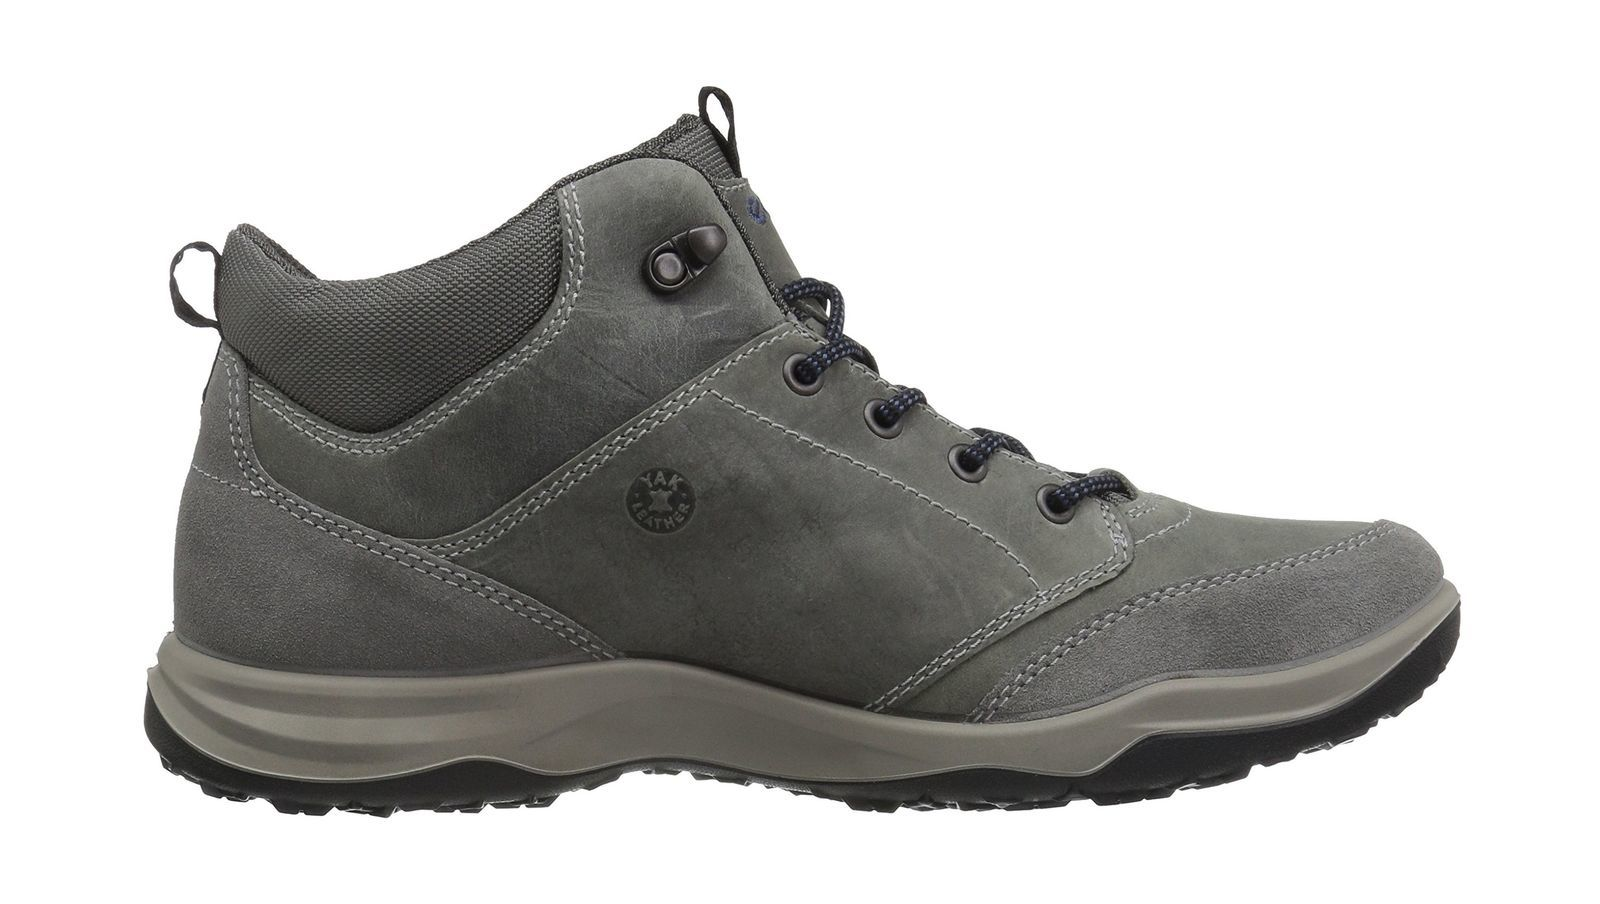 Mens Espinho Hiking Boot, Titan Ecco